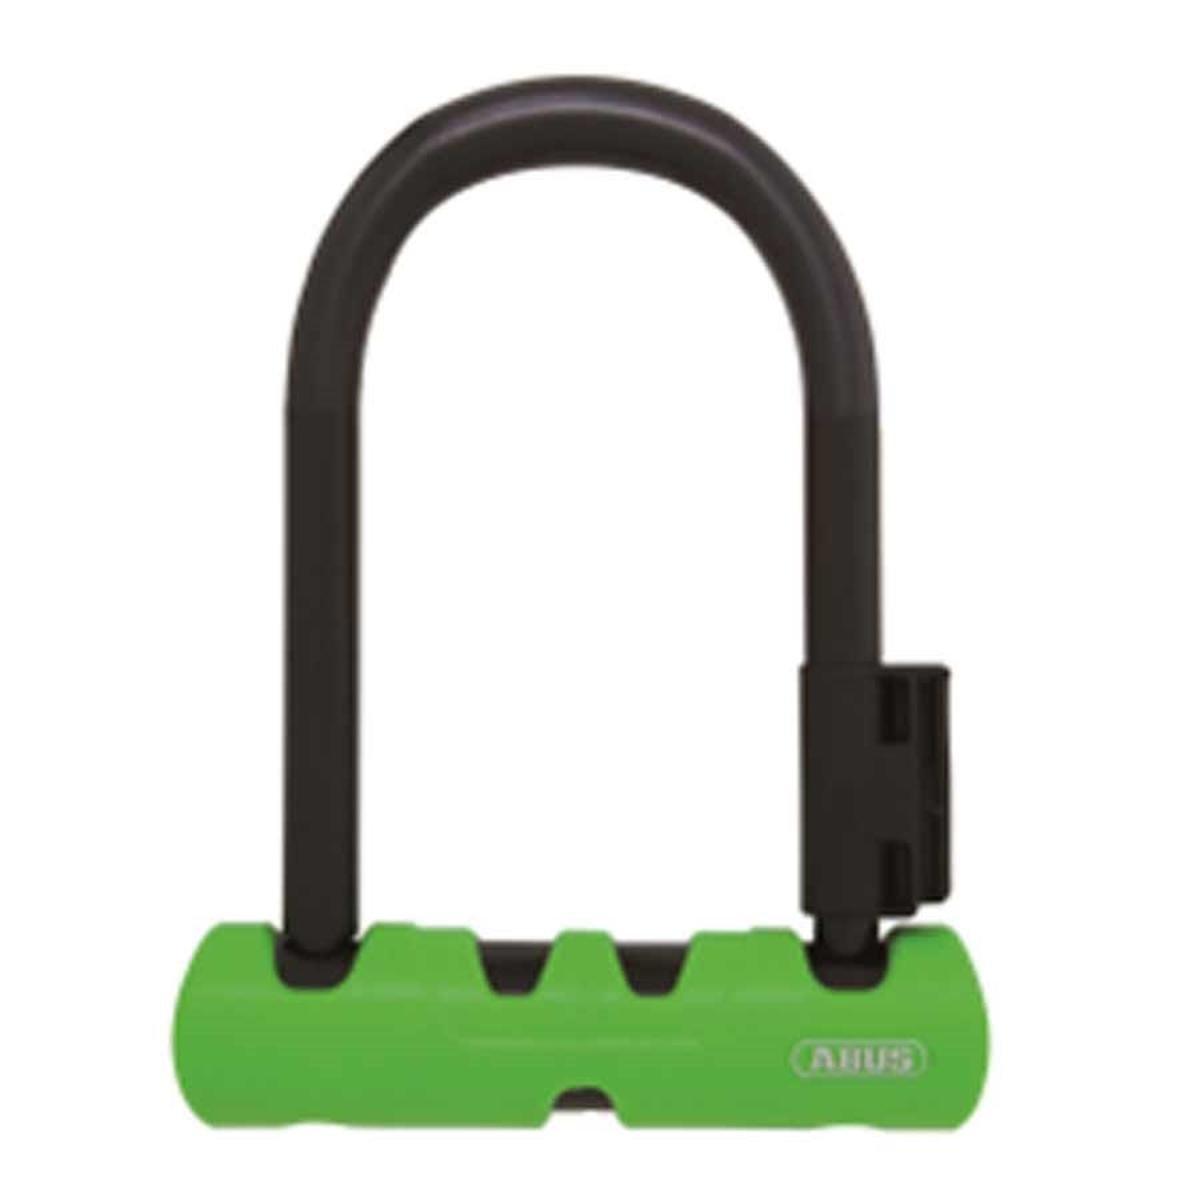 ABUS Ultra 410 Mini LS w/ Cable by Abus   B013F4I3R4